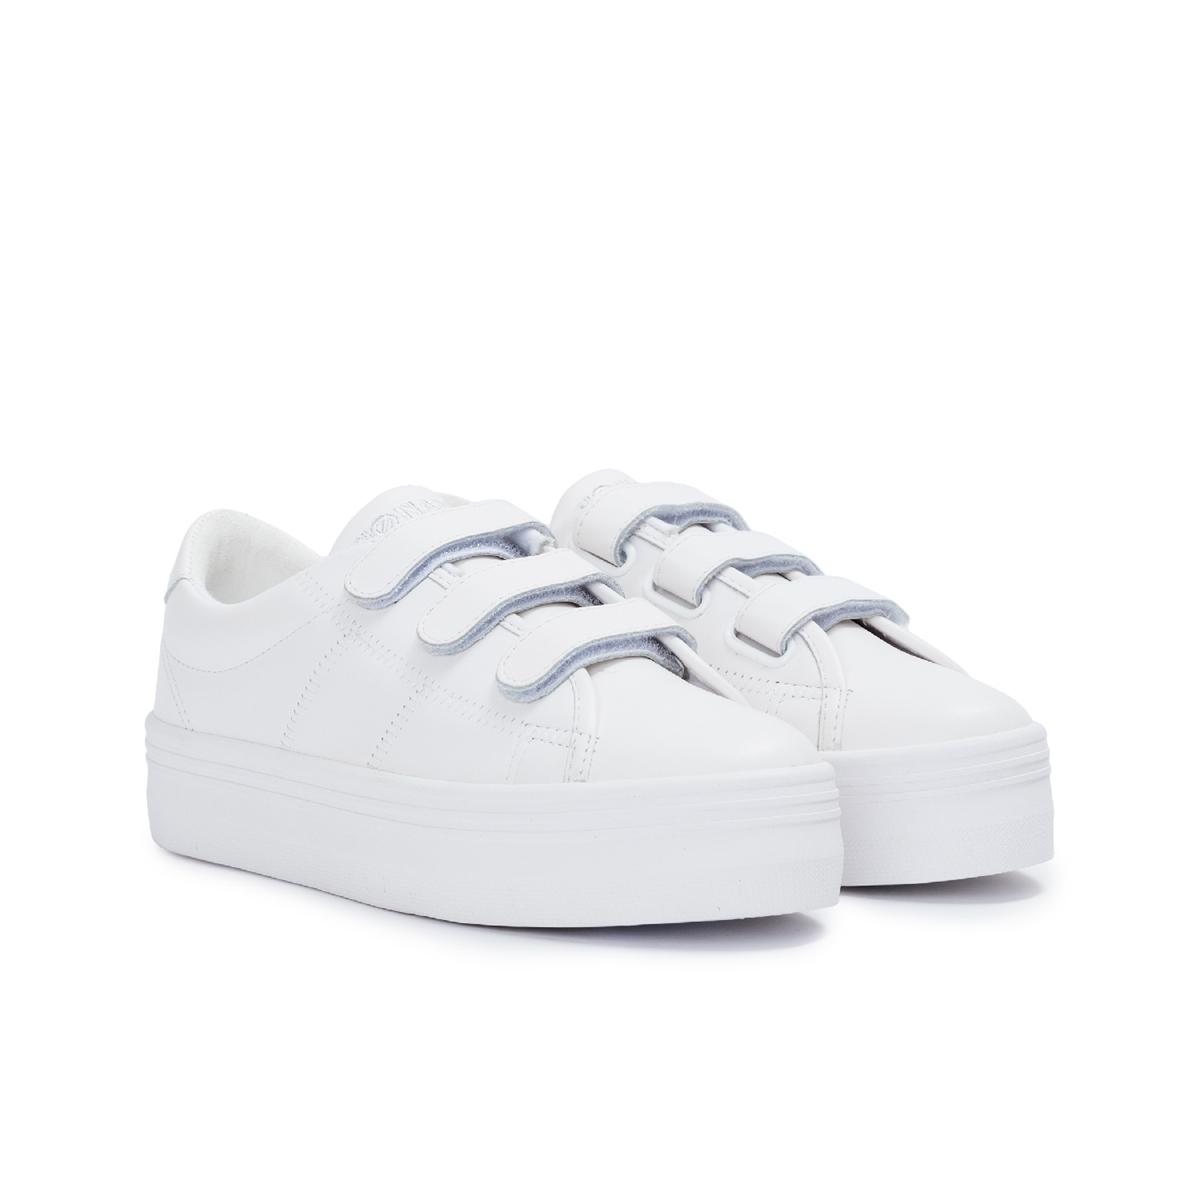 NO NAME ノーネーム PLATO-01250-WHITE プラト ホワイト